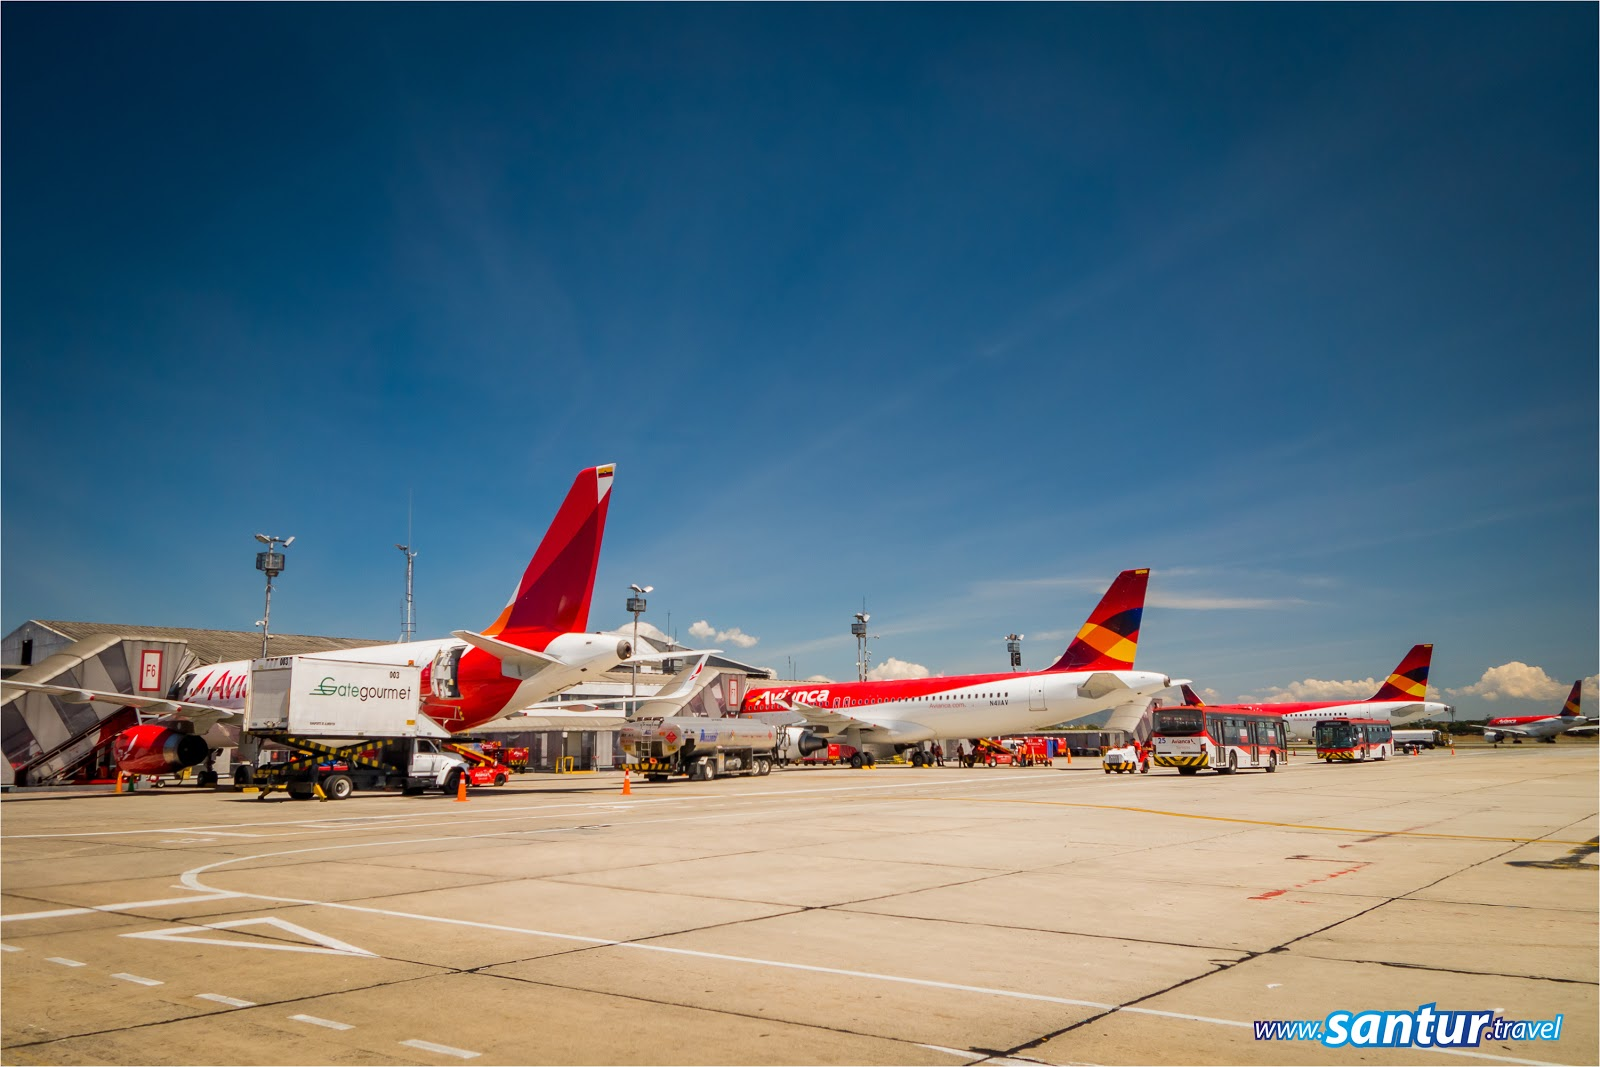 aerocivil, aerolinea, Aeropuerto Internacional el Dorado, Agencia de Viajes, Avianca, Bogota, Bucaramanga, Call center, Cambio de Horario, Cambio itinerario, Colombia, pasajeros, Reservas